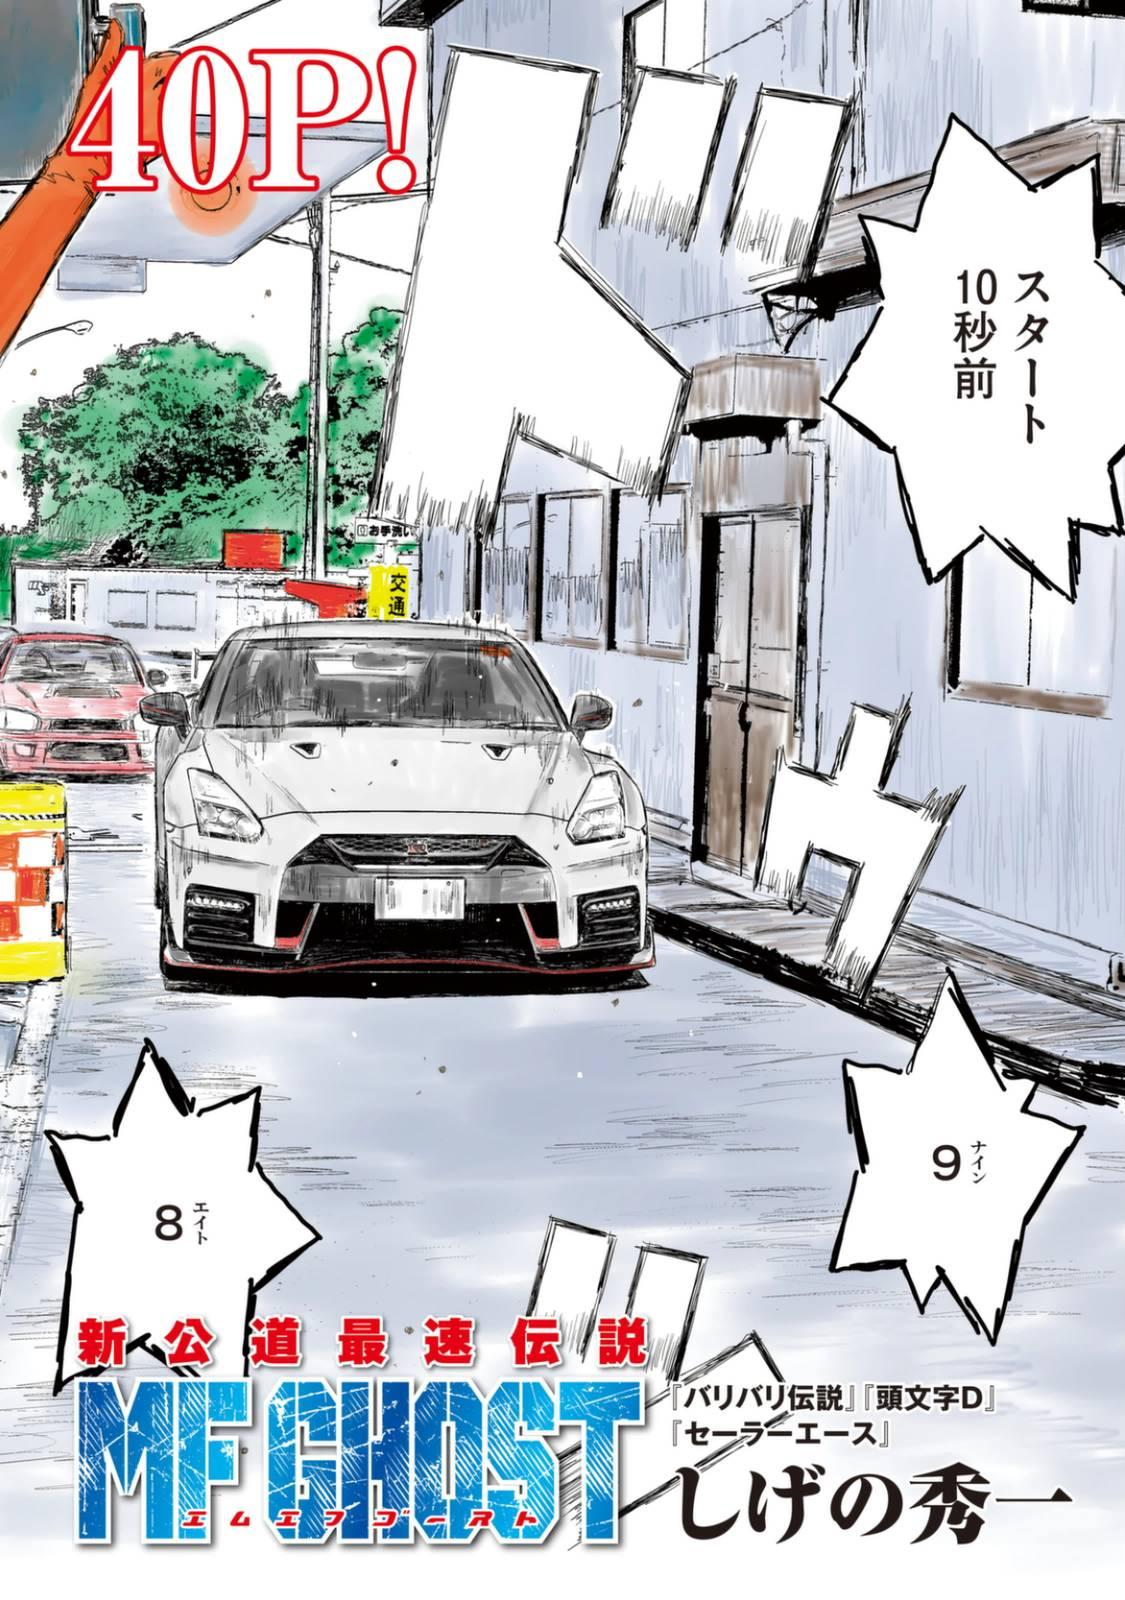 Category:Cars | MF Ghost Wiki | FANDOM powered by Wikia